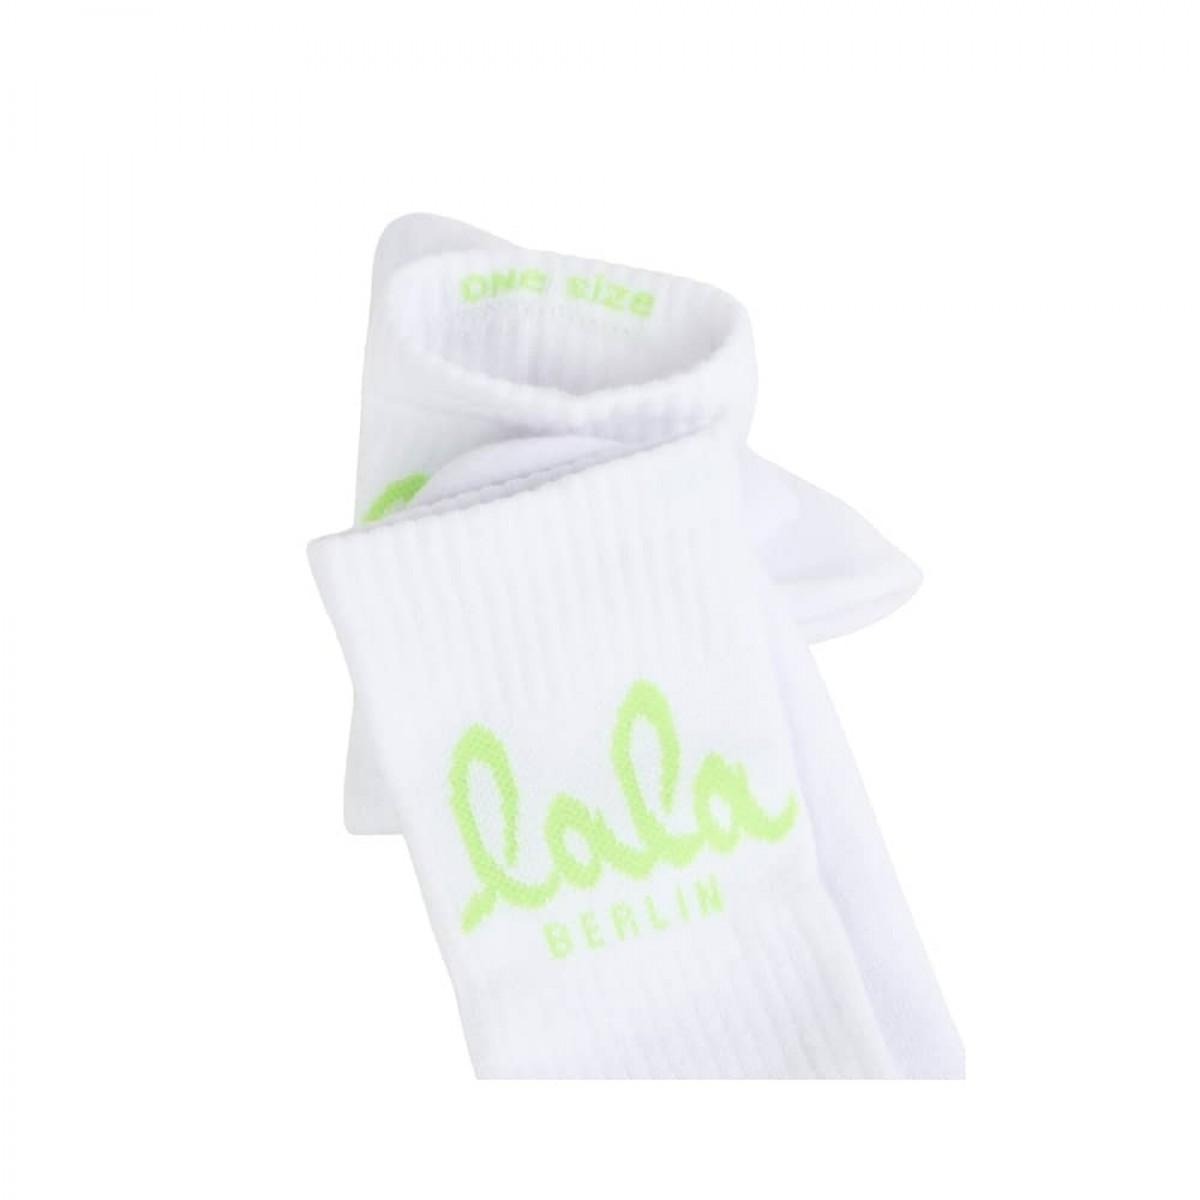 sanny socks logo - neon green - logo